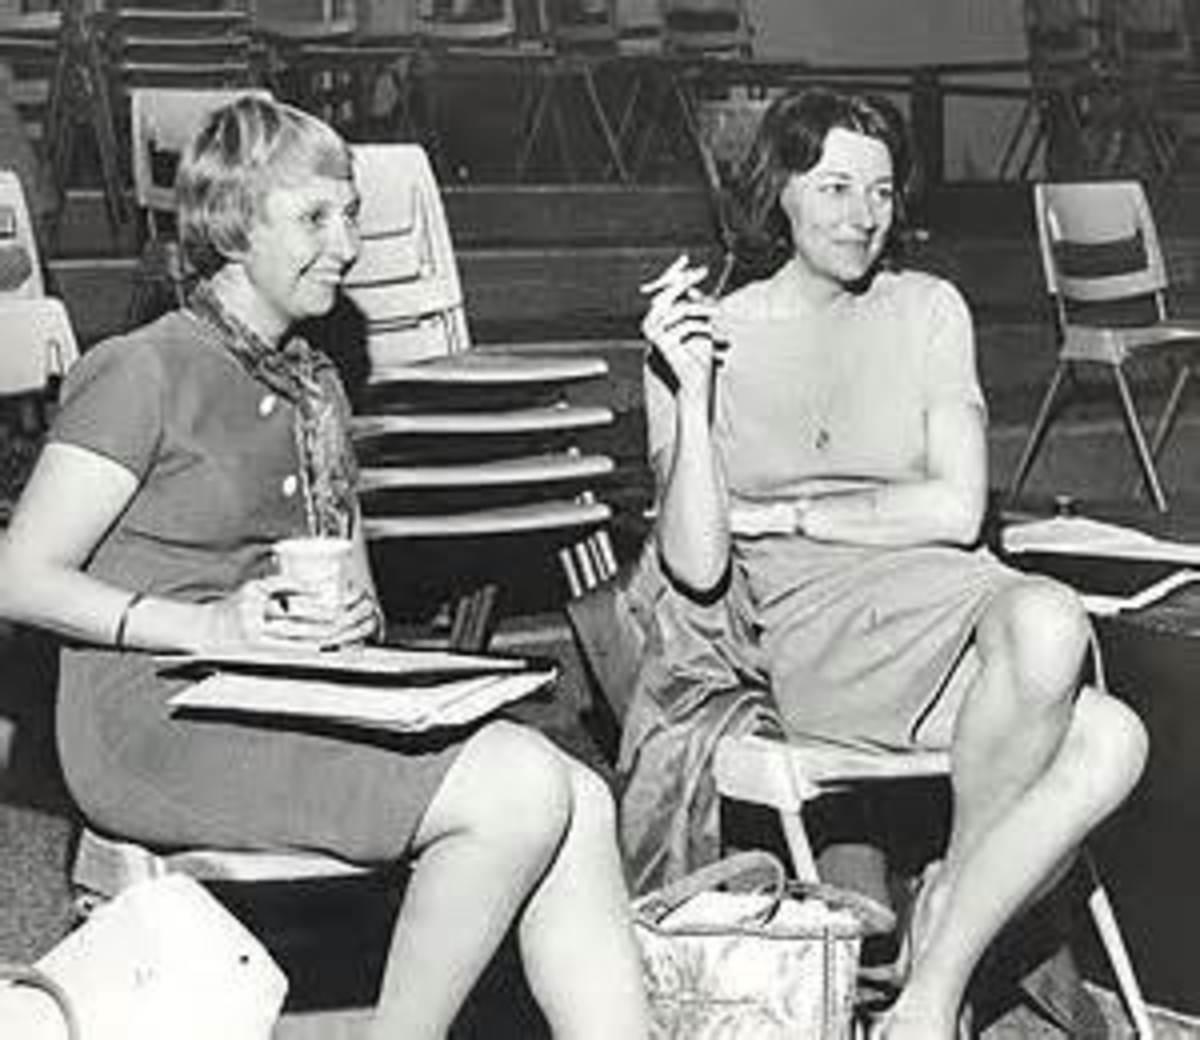 Maxine Kumin and Anne Sexton